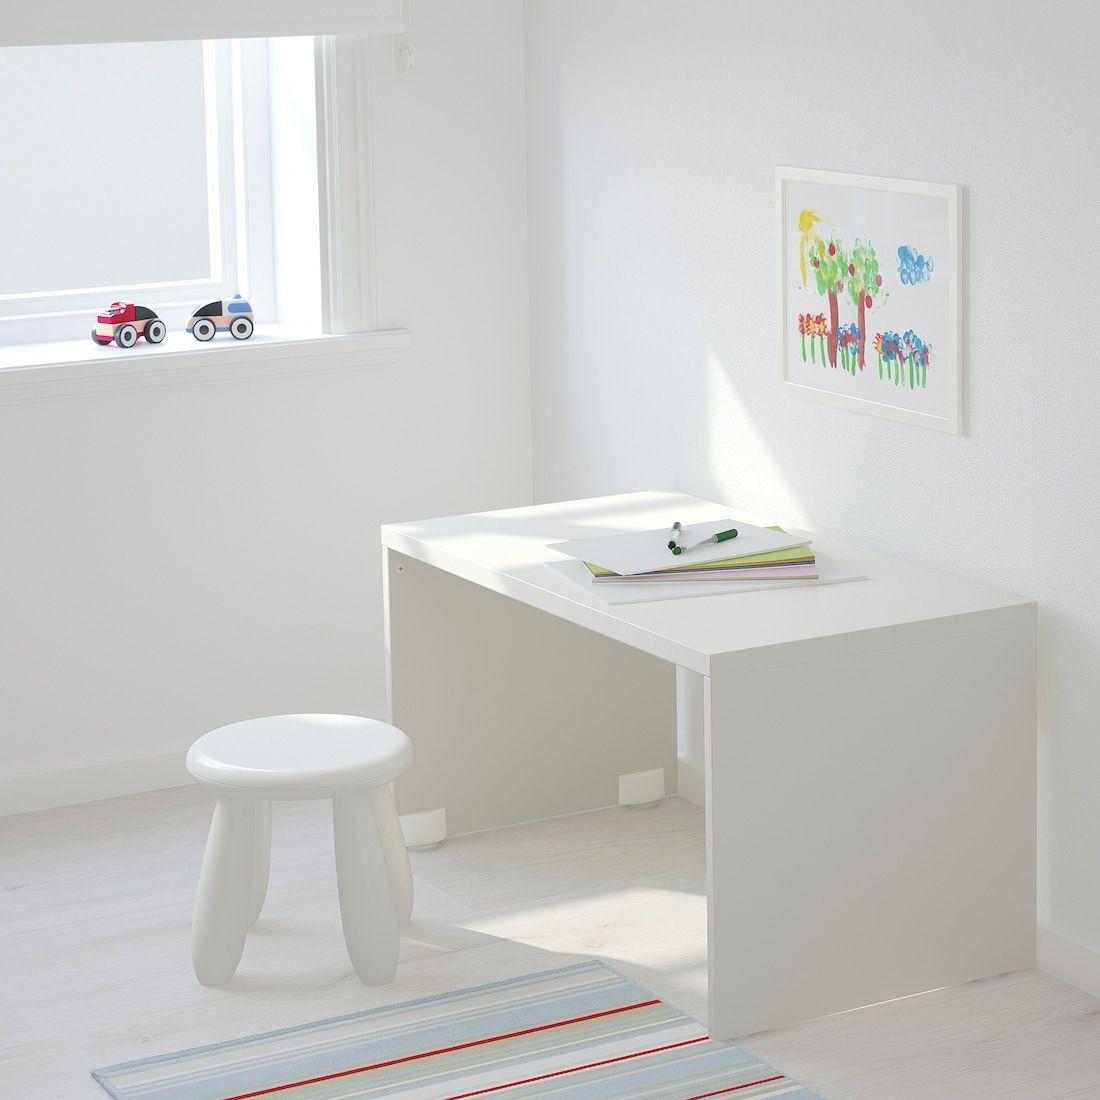 STUVA Banco, blanco, 90x50x50 cm IKEA en 2020 | Banco